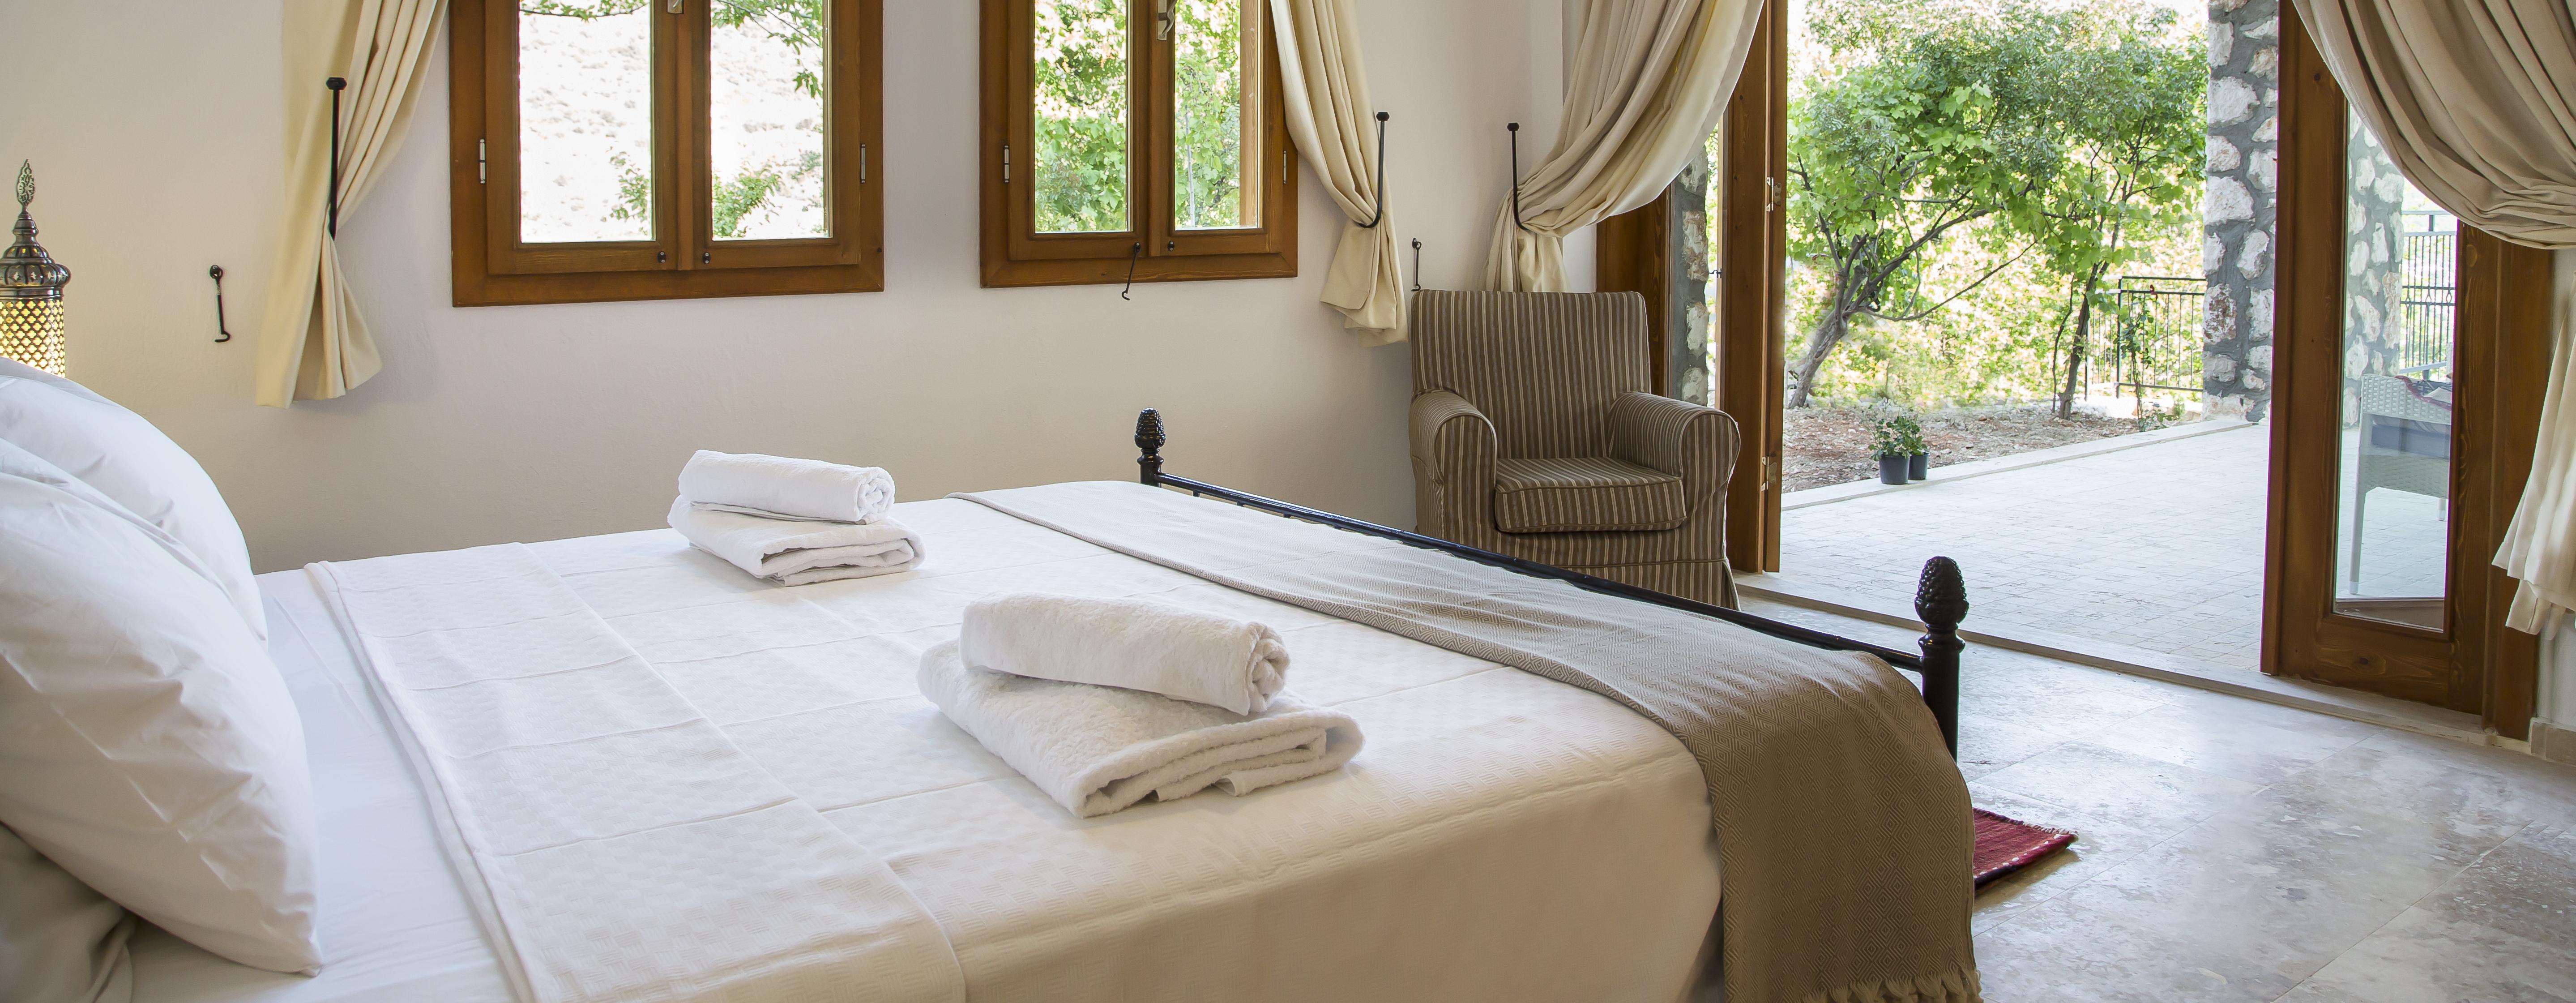 luxury-3-bed-pool-villa-islamlar